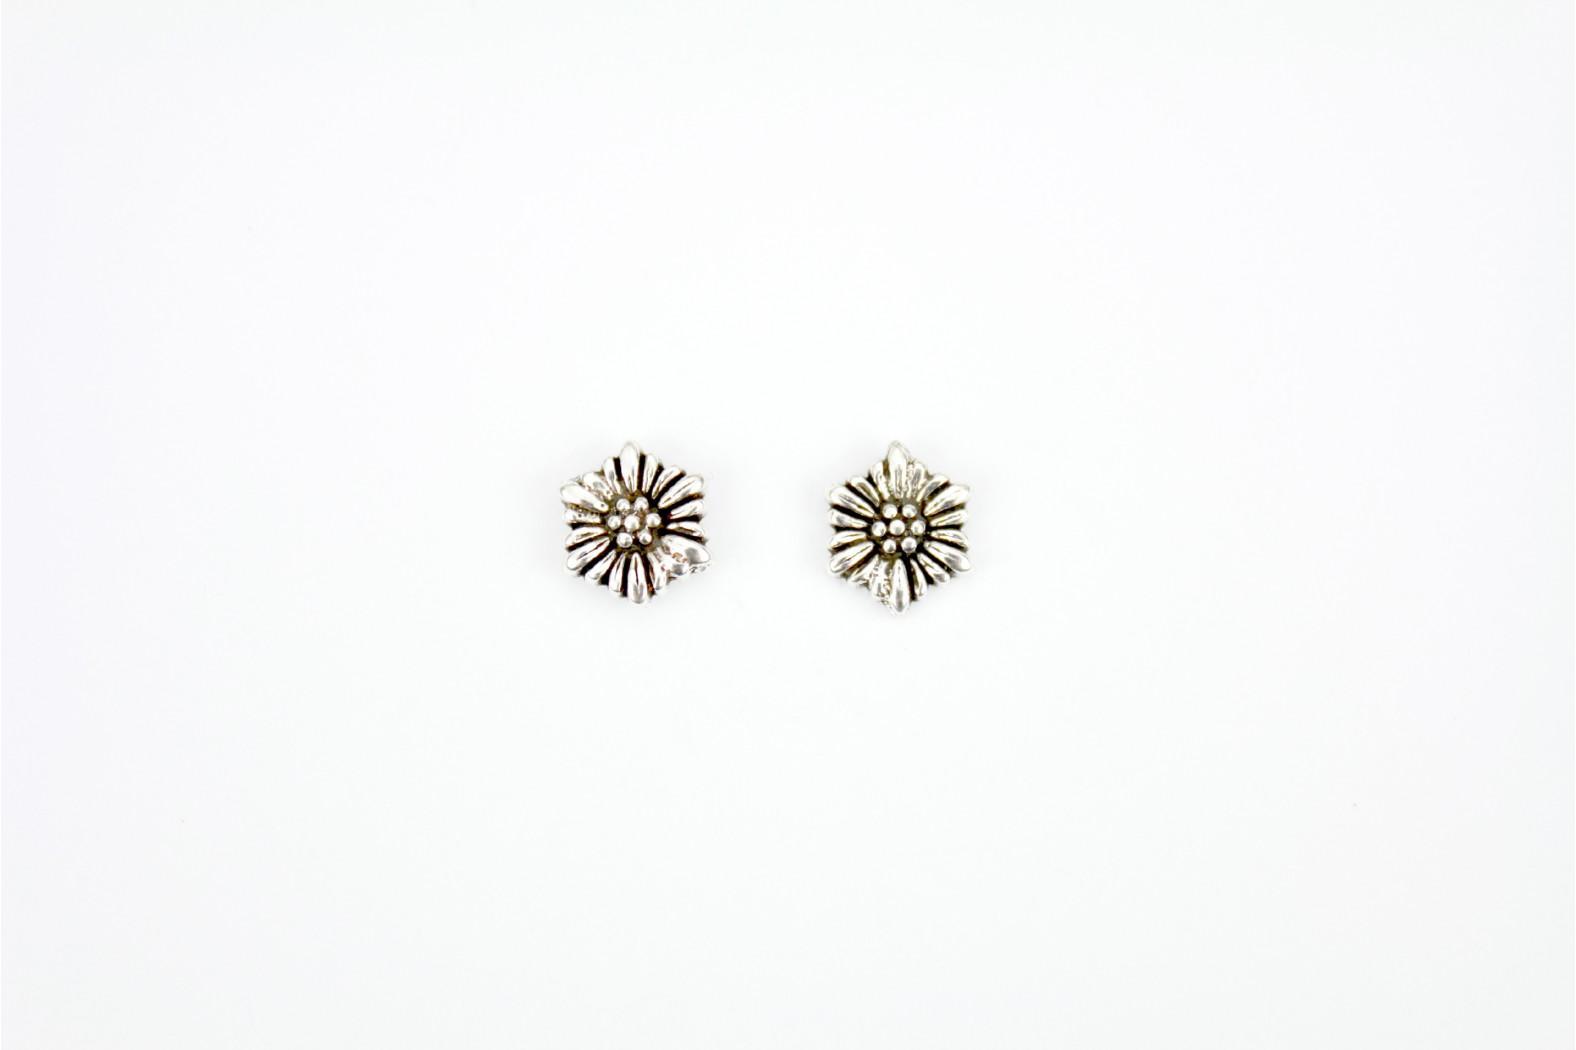 Large Flower Design silver stud earrings